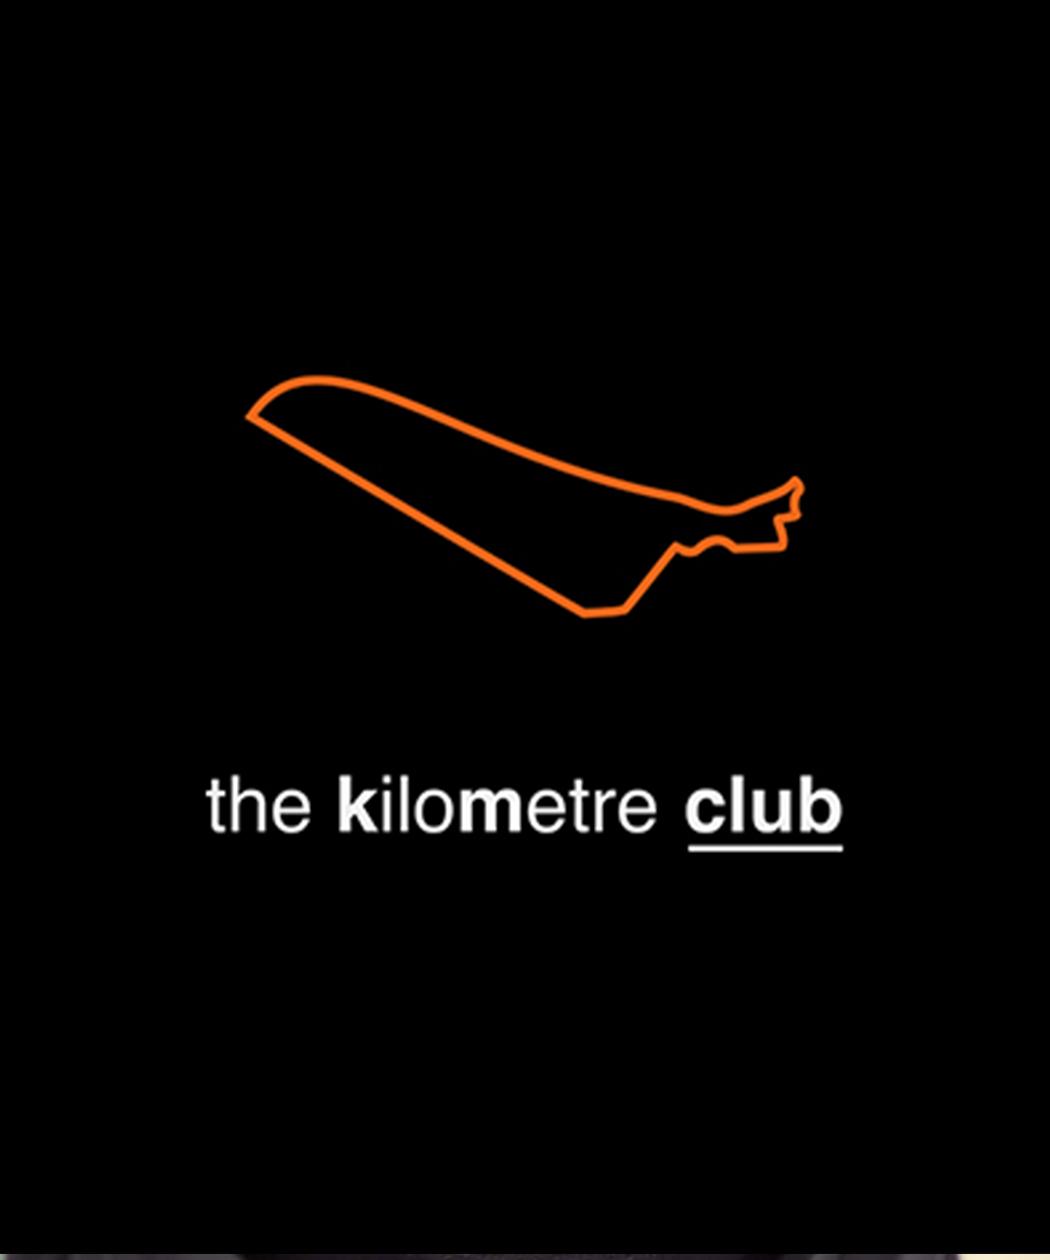 saw icon design for kilometre running club